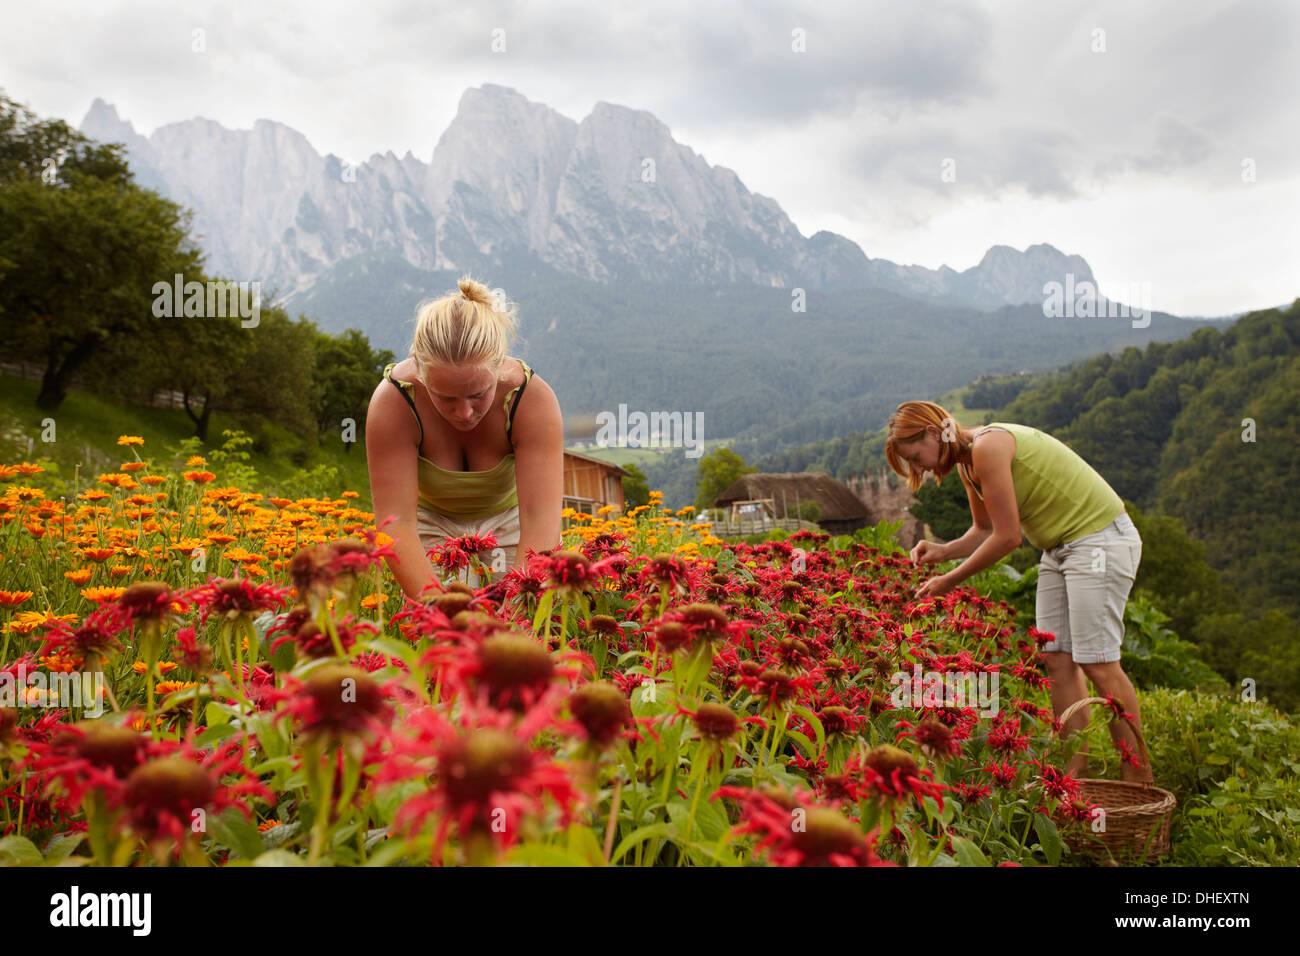 Women picking flowers - Stock Image